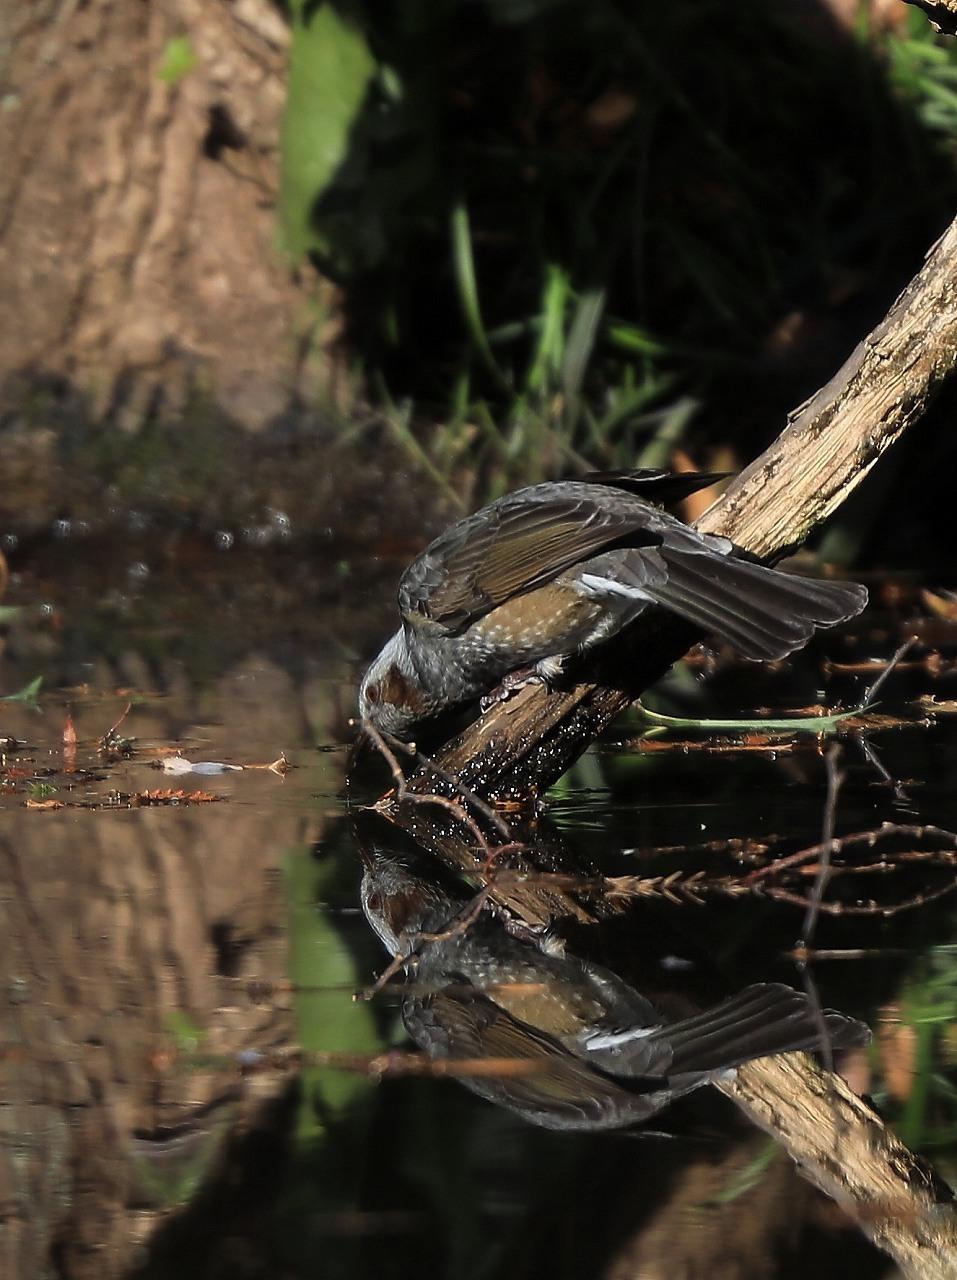 H野鳥の森にて_f0296999_15030957.jpg